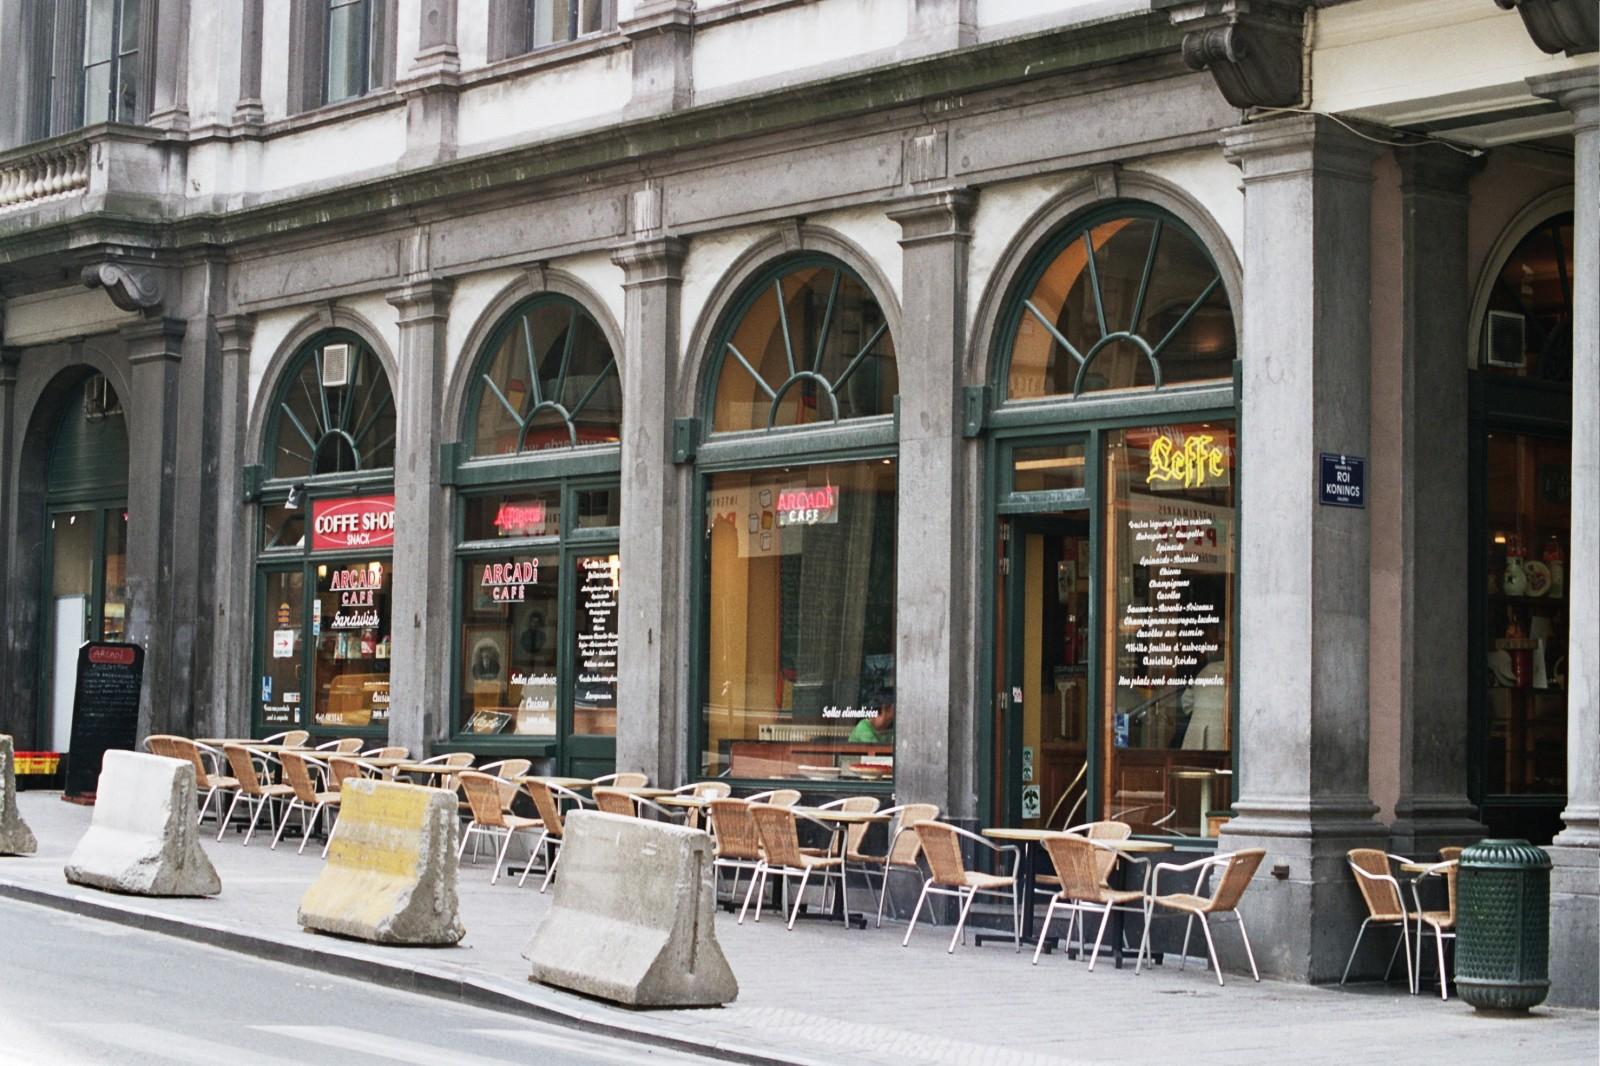 Arcades, Galerie du Roi, Bruxelles, 1846-1847, architecte Jean-Pierre Cluysenaar., 2005